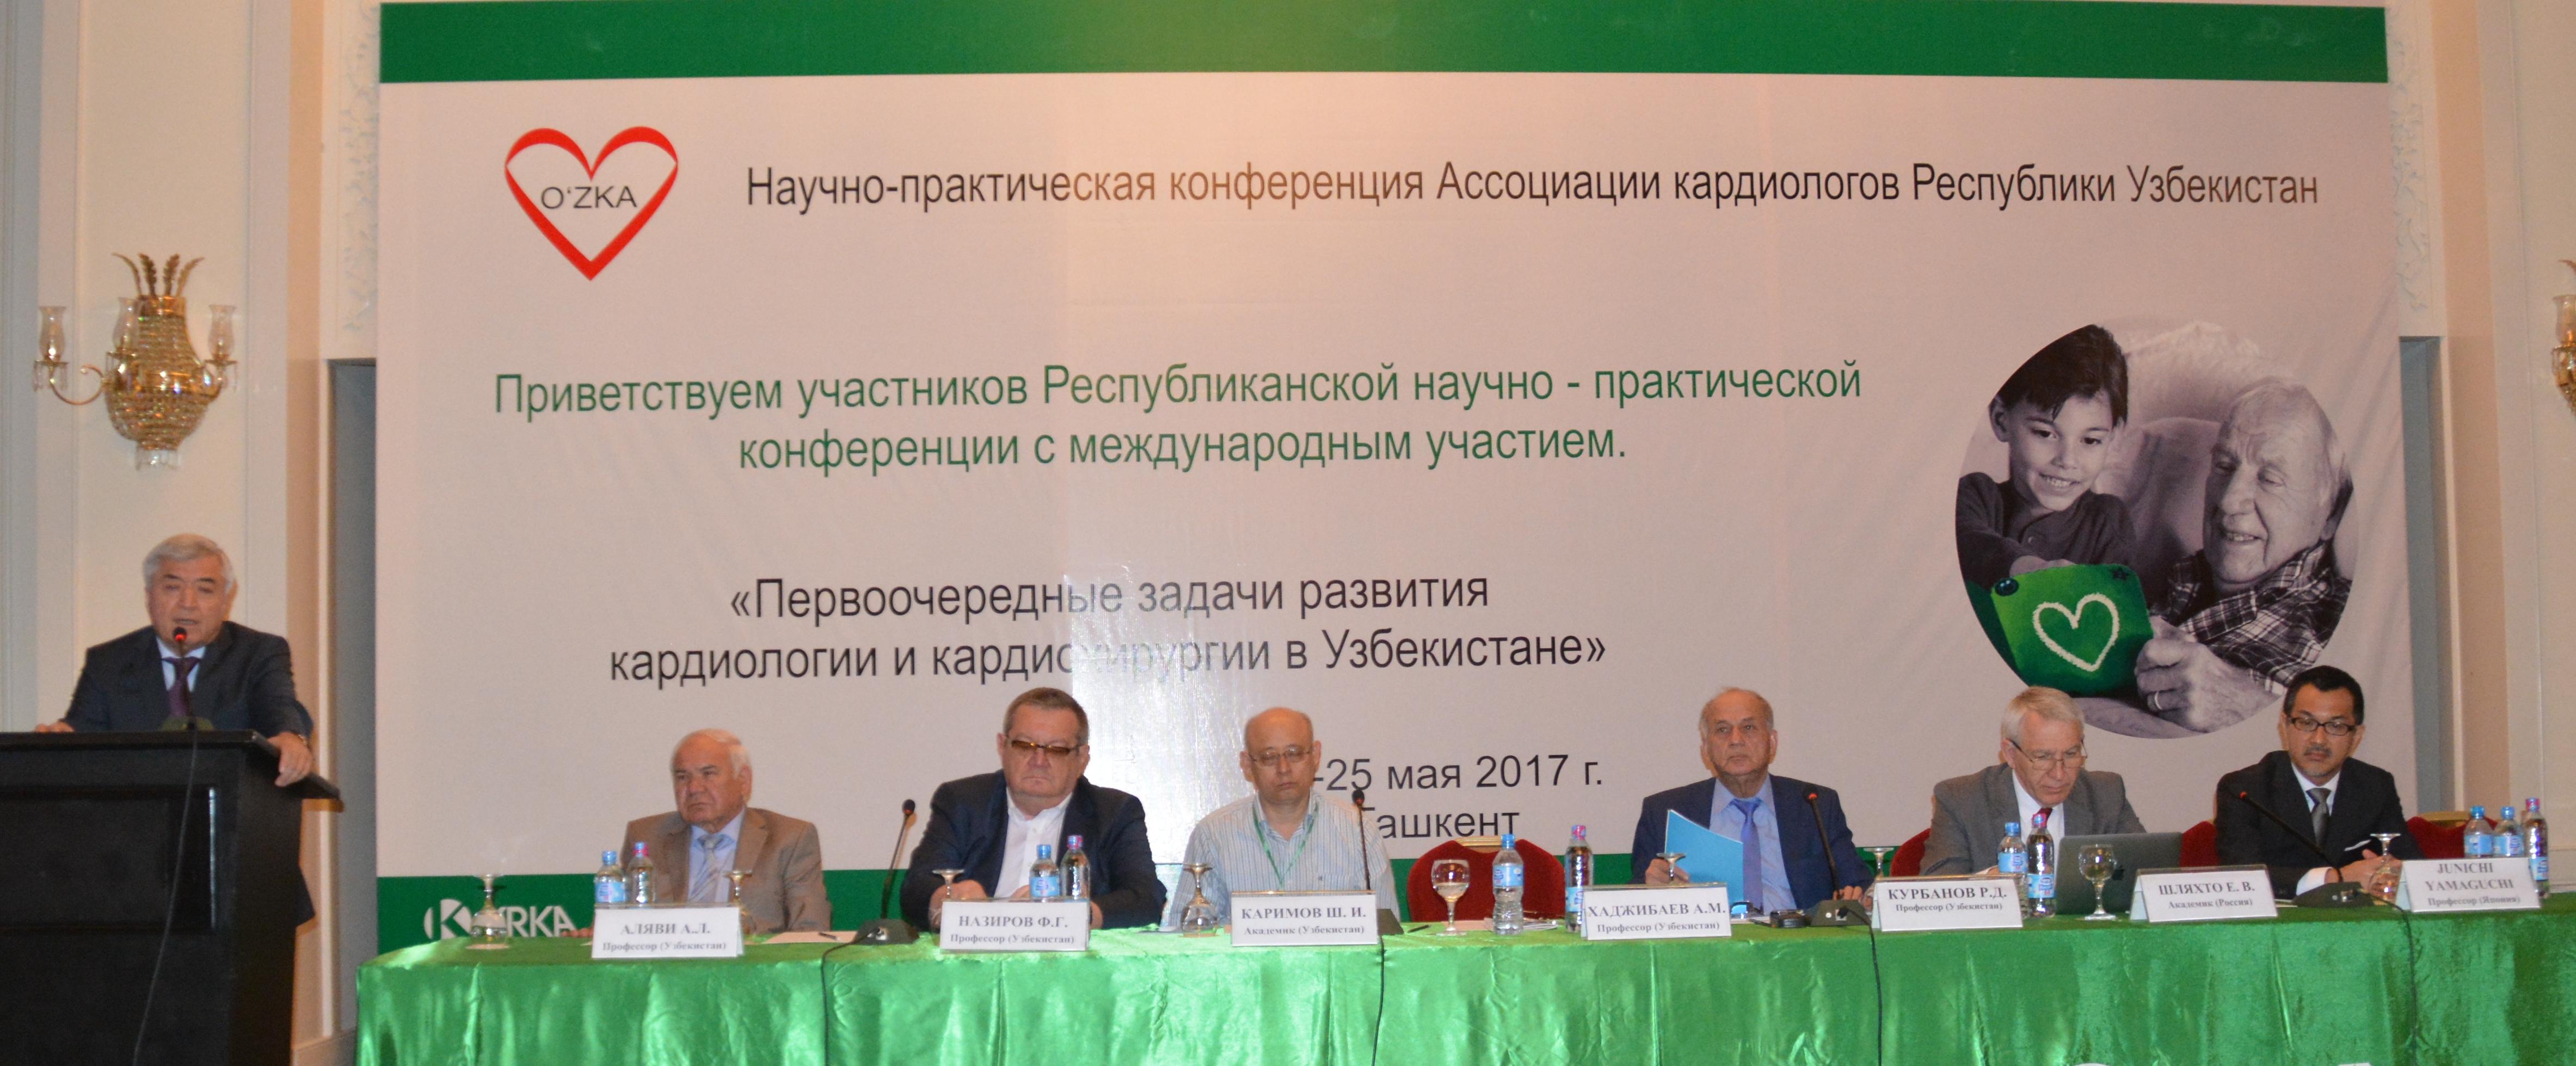 http://medicalexpress.ru/uploads/reportss/kardio%20askar/DSC_0070%20-%20kopiya.JPG